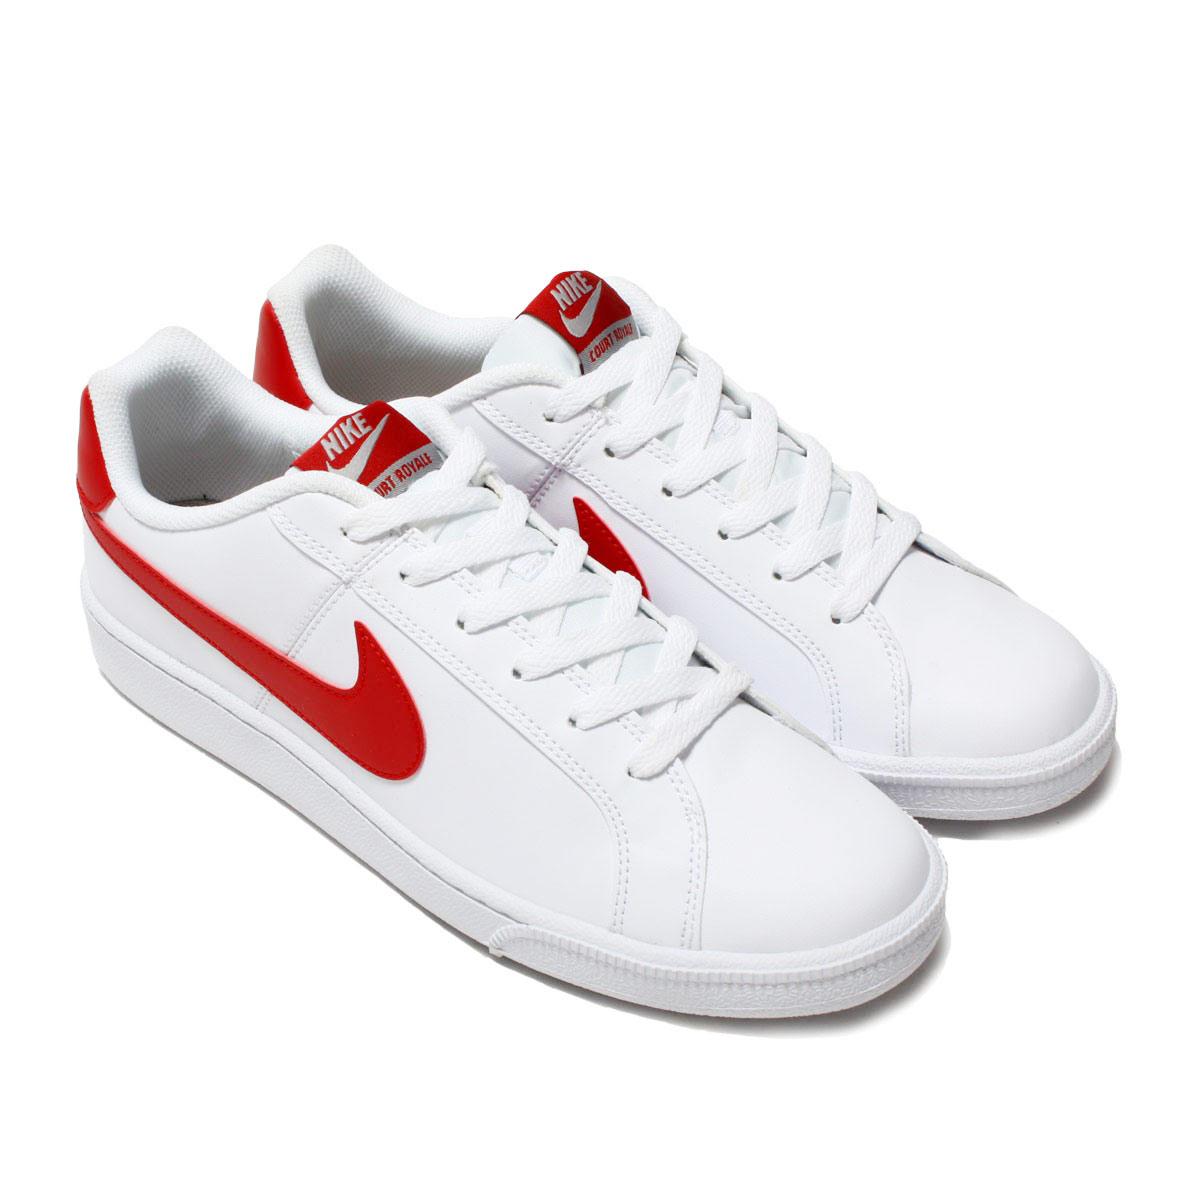 atmos pink  NIKE COURT ROYALE SL (Nike coat royal SL) WHITE GYM RED ... cb13c5f1e2a3